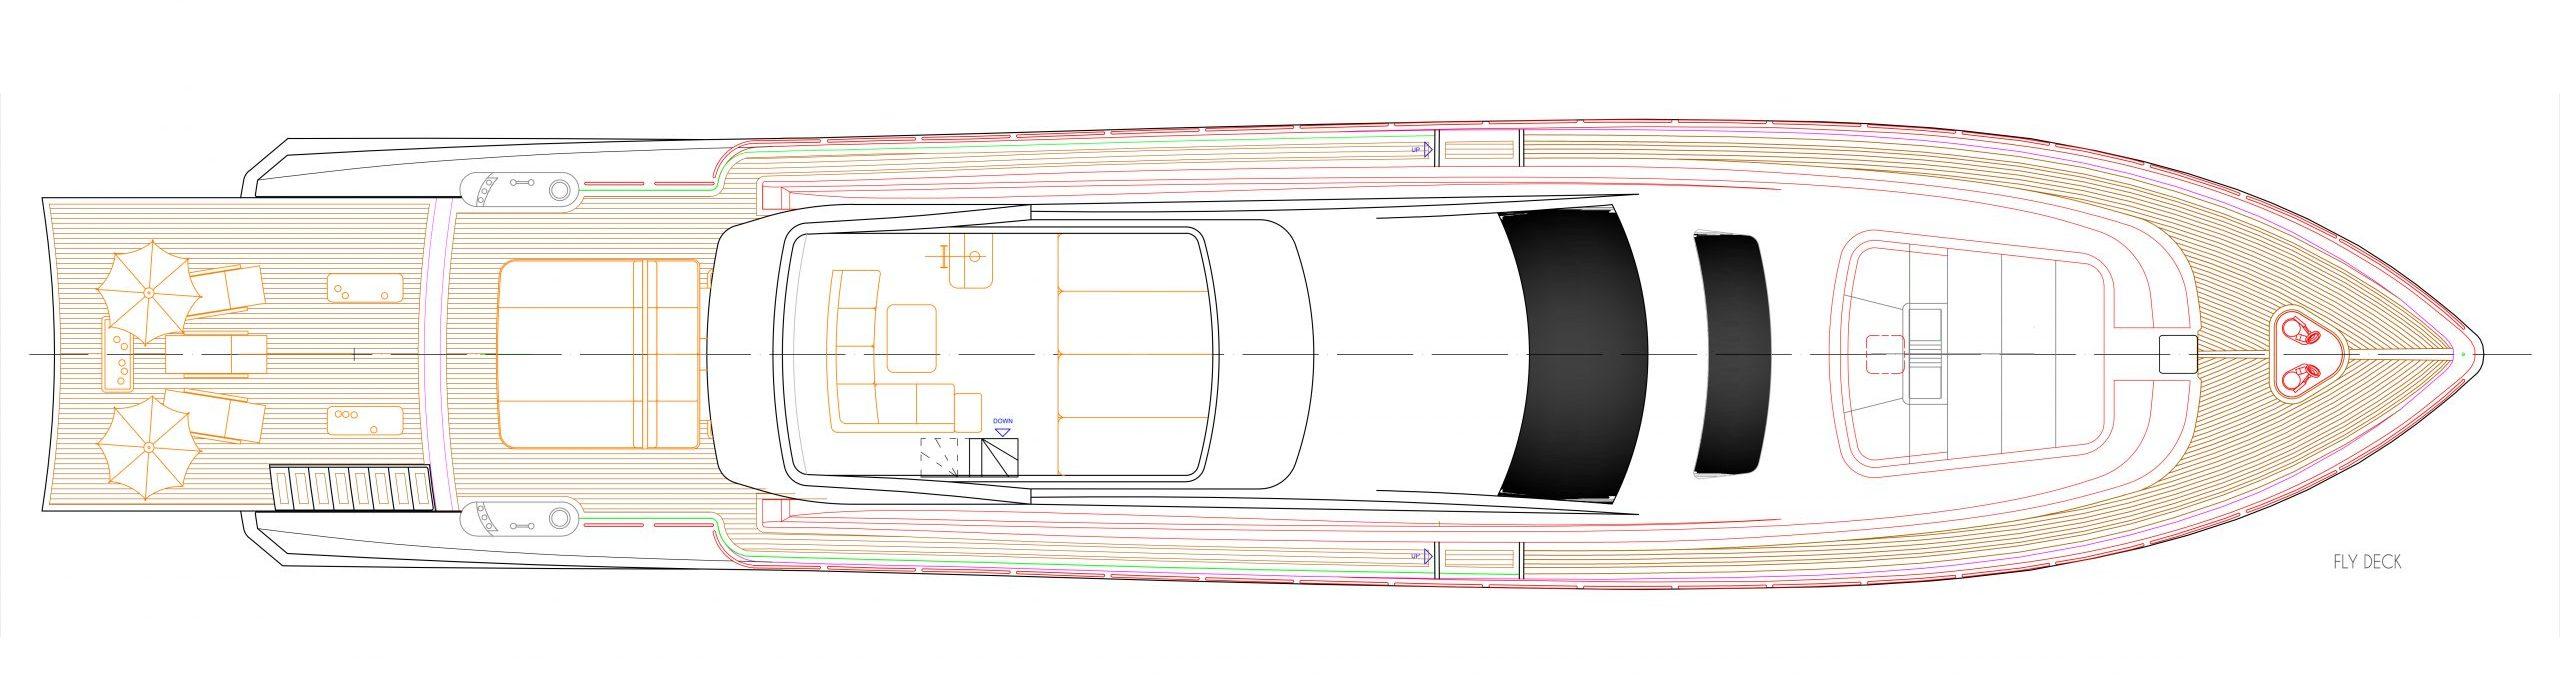 leopard fly deck version 1